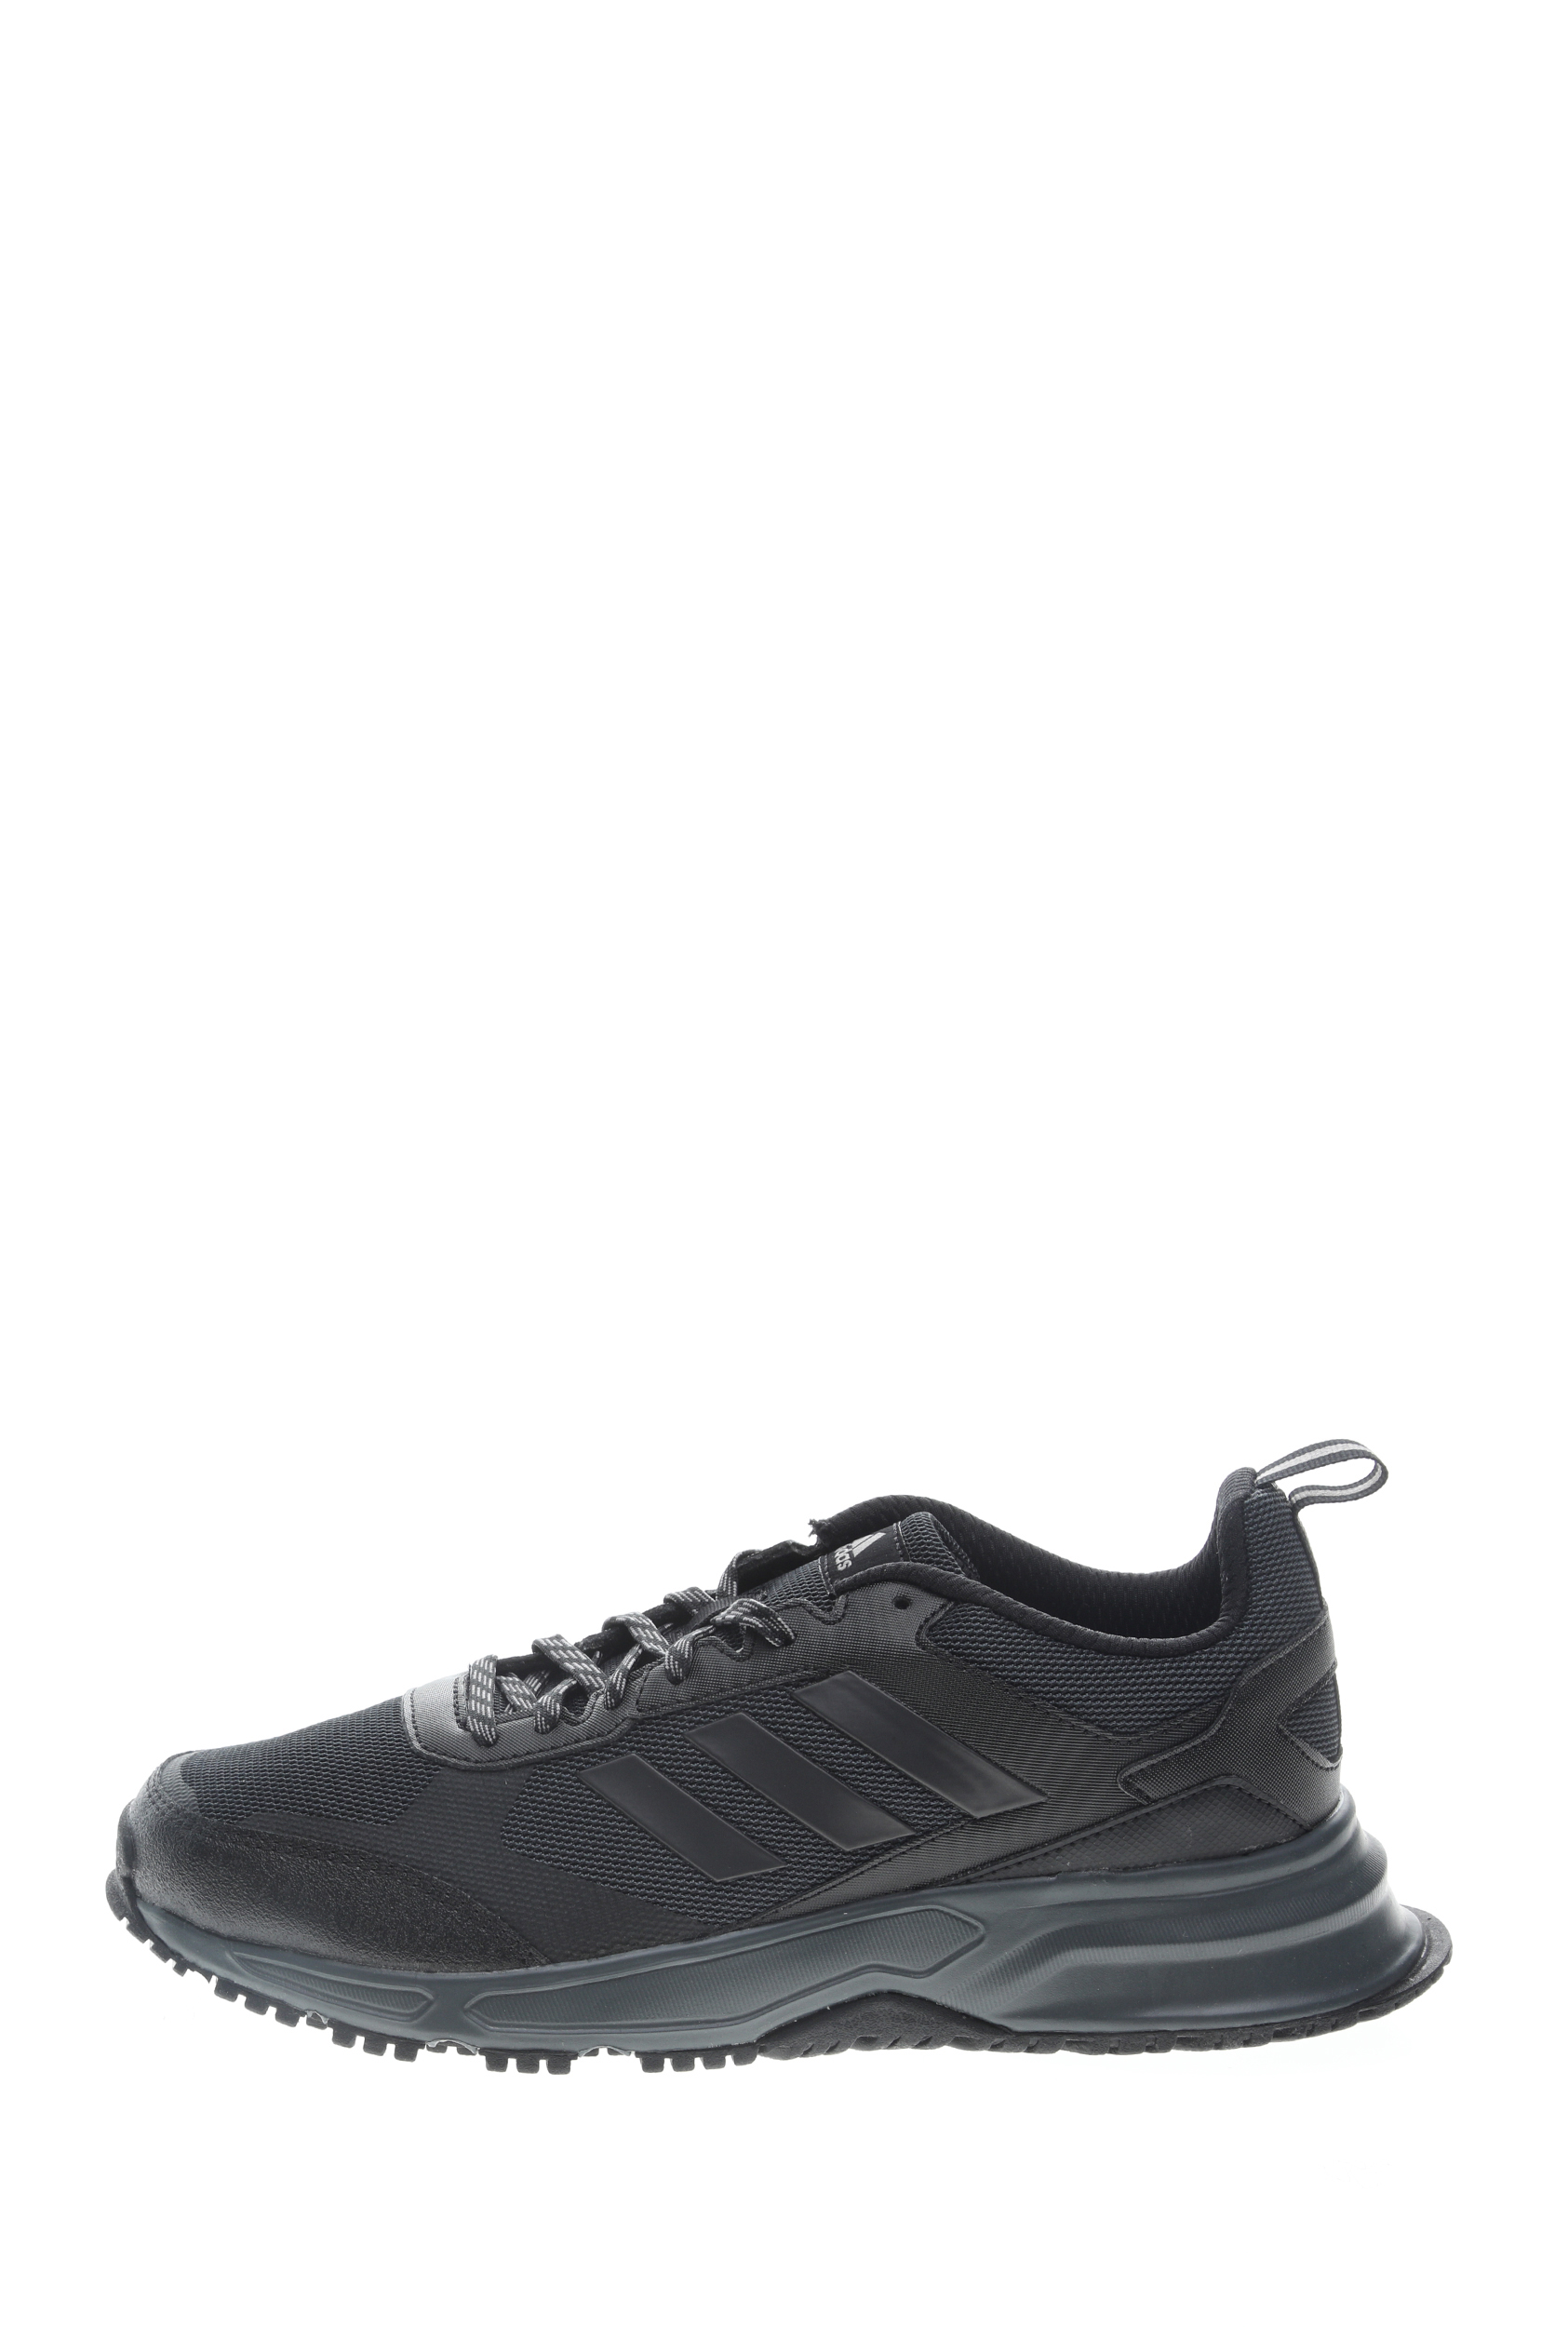 adidas Performance – Ανδρικά παπούτσια running adidas Performance ROCKADIA TRAIL 3 μαύρα